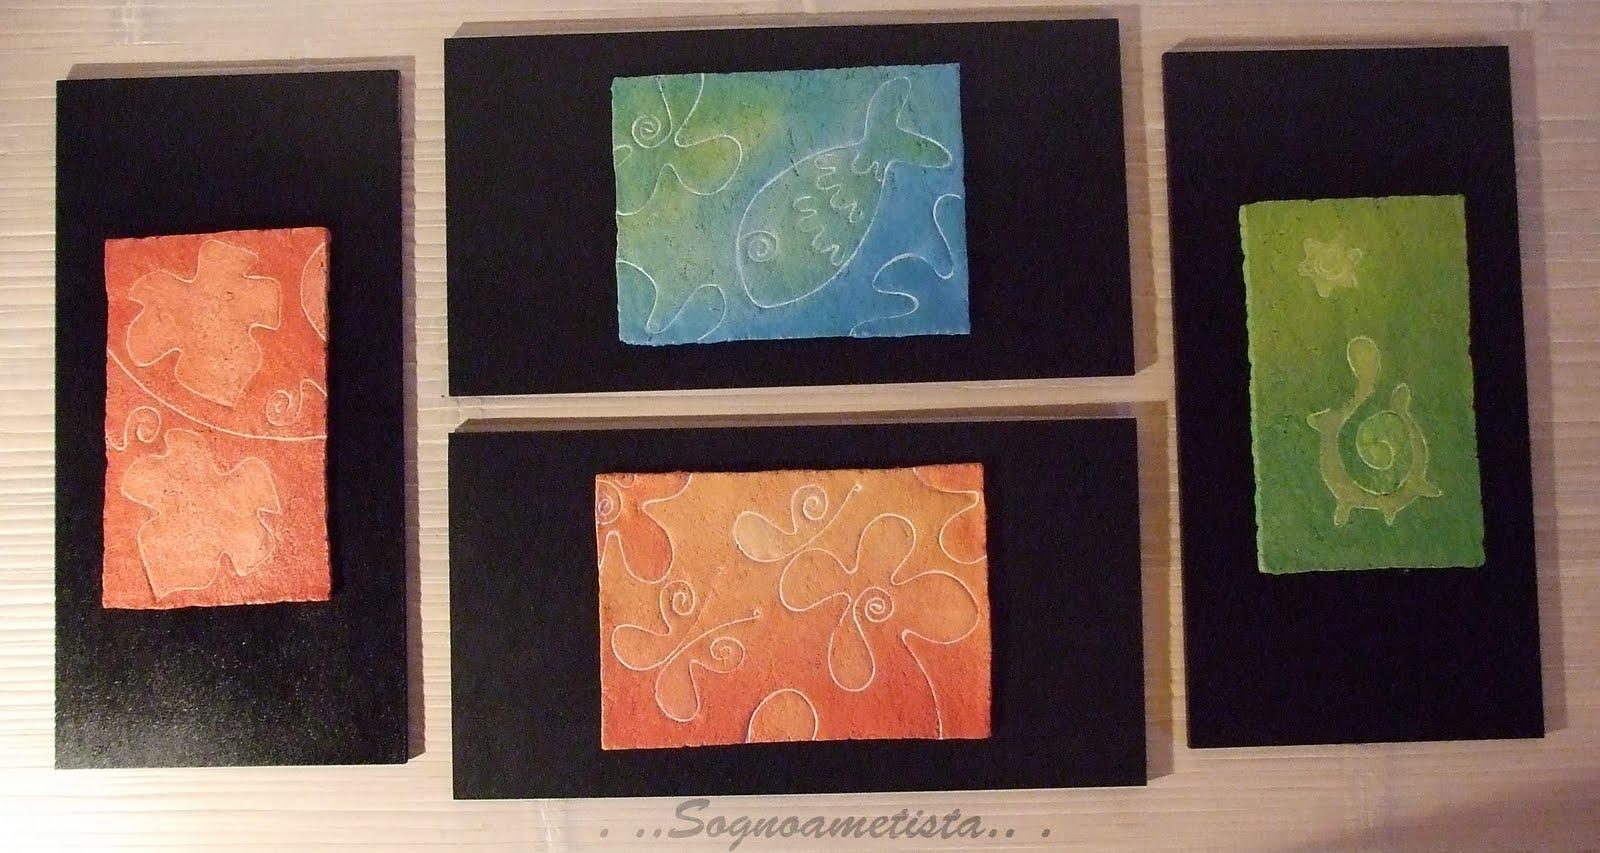 Sognoametista pannelli decorativi linea frammenti - Lds pannelli decorativi ...